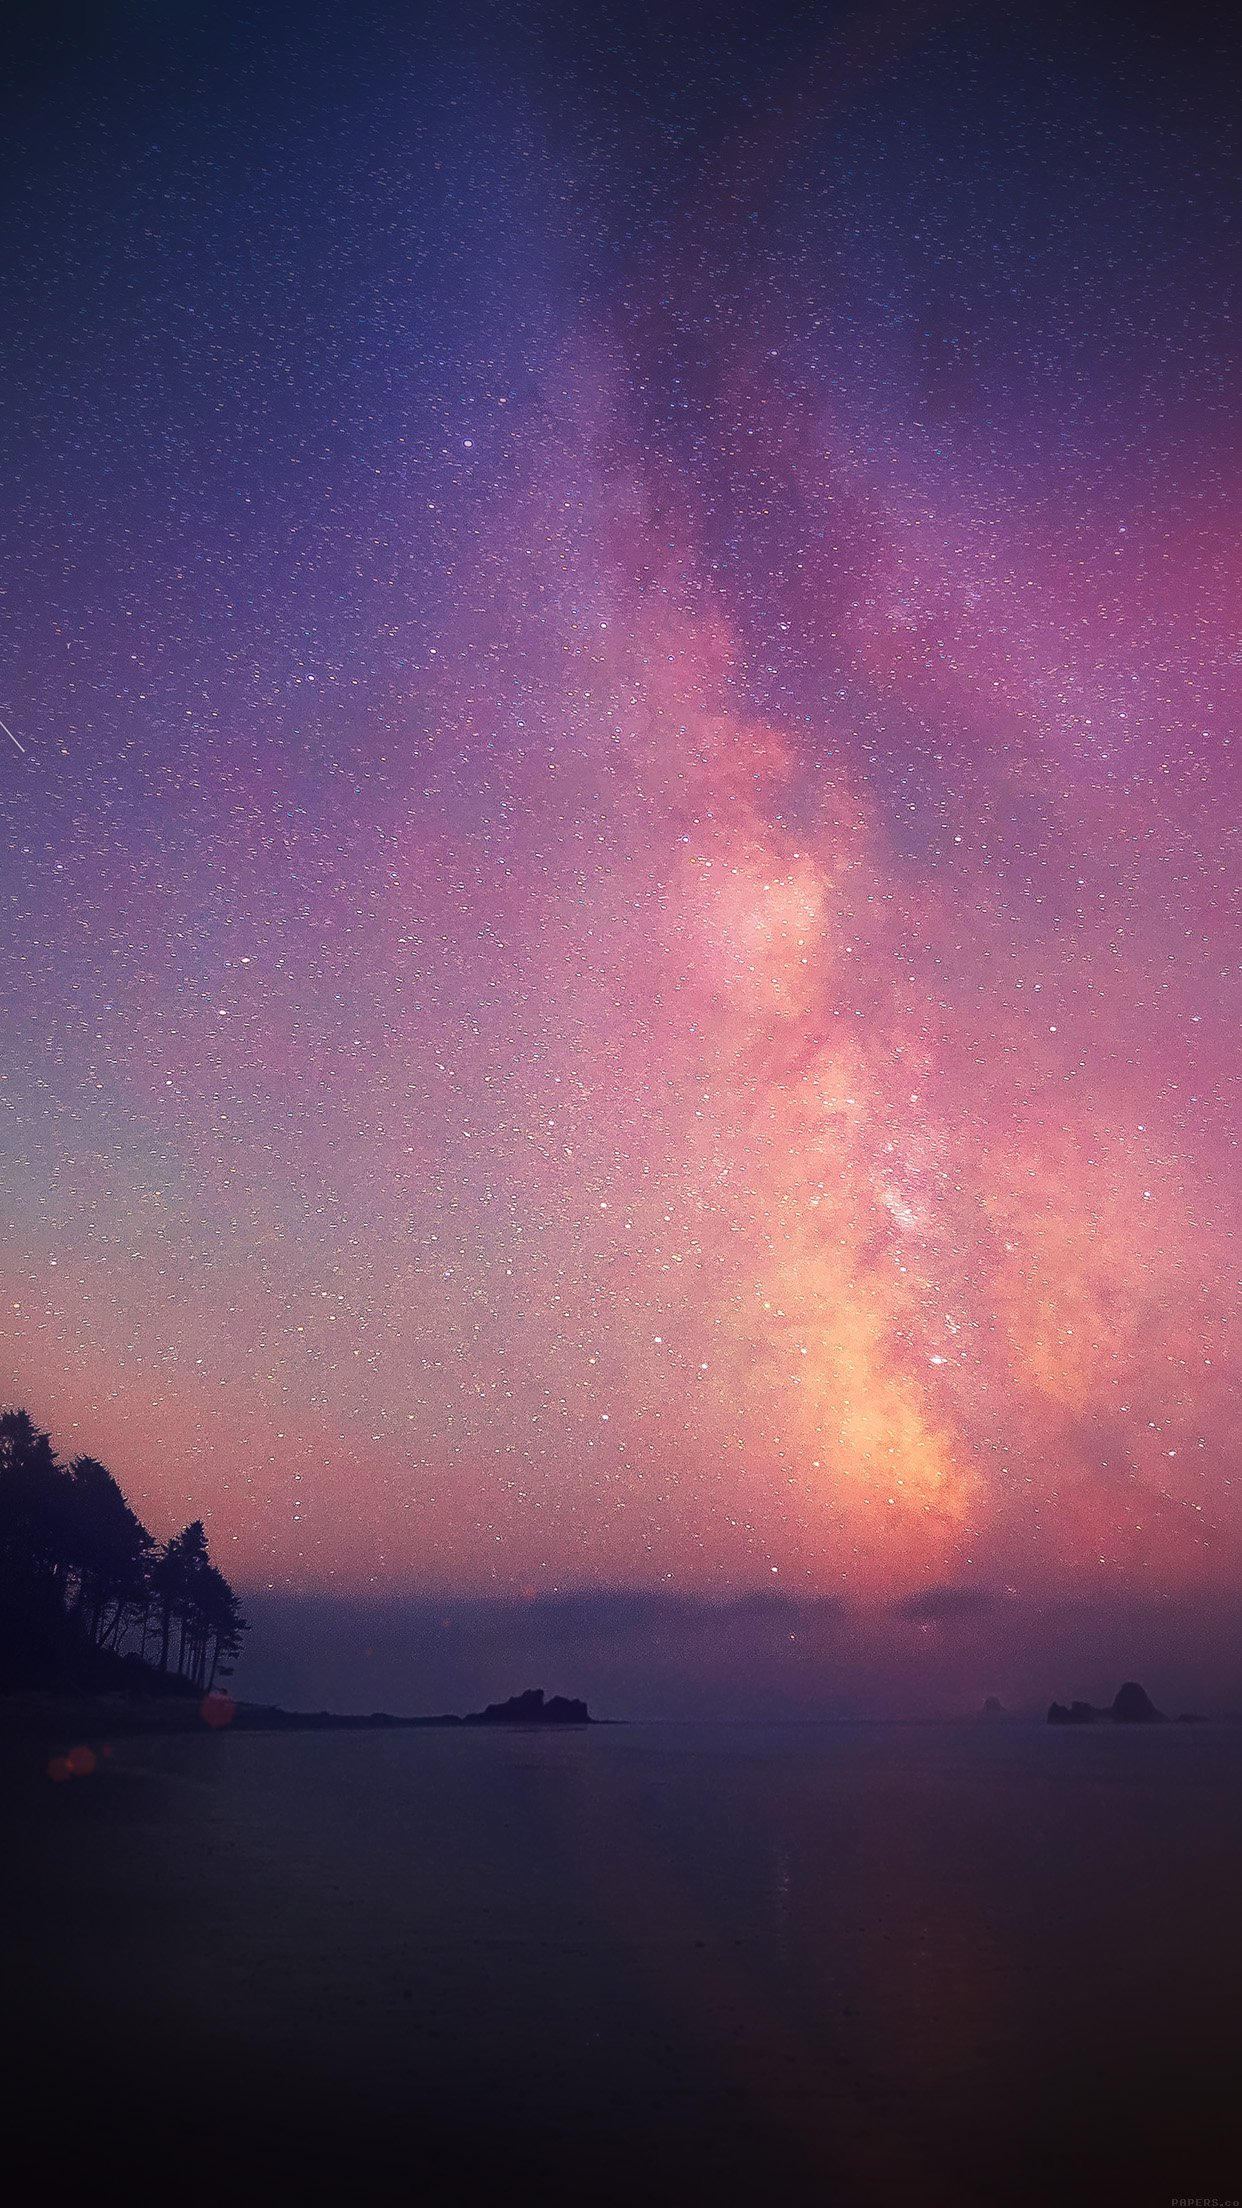 11 119556 pink night sky wallpaper hd